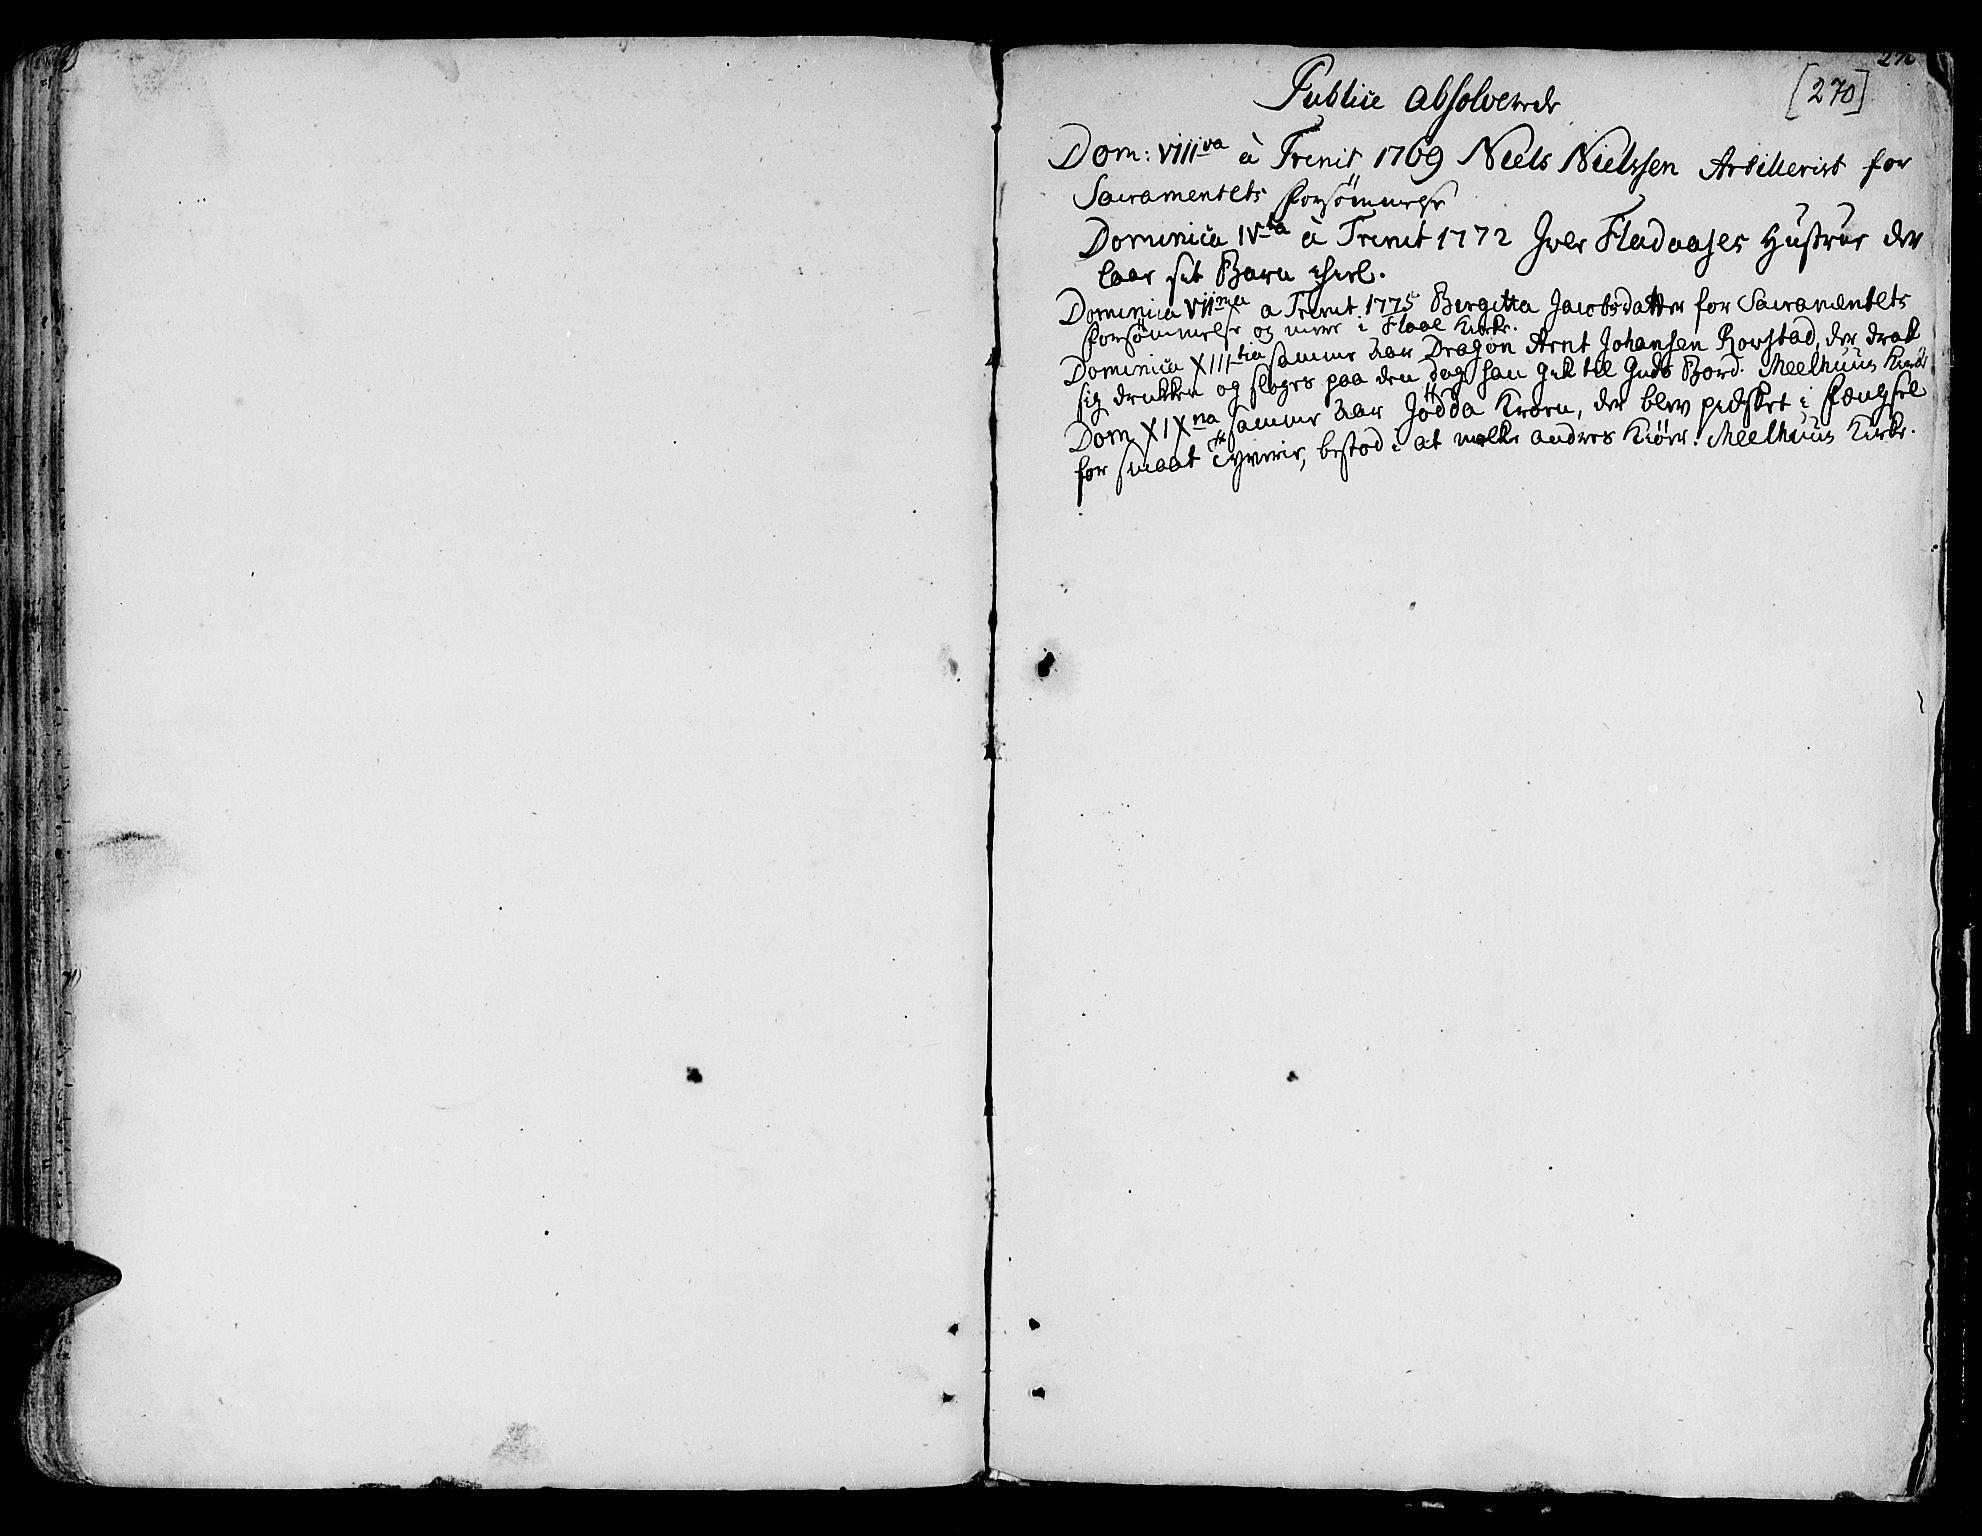 SAT, Ministerialprotokoller, klokkerbøker og fødselsregistre - Sør-Trøndelag, 691/L1061: Parish register (official) no. 691A02 /1, 1768-1815, p. 270